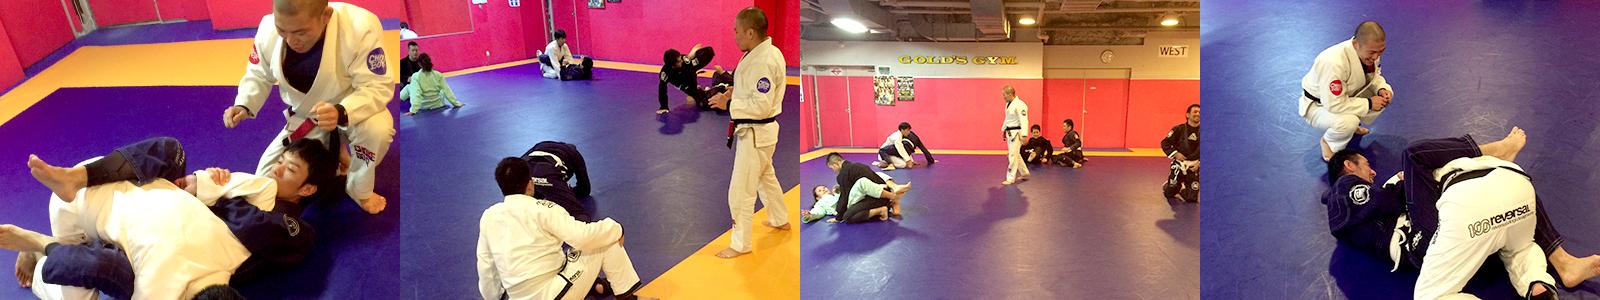 training05